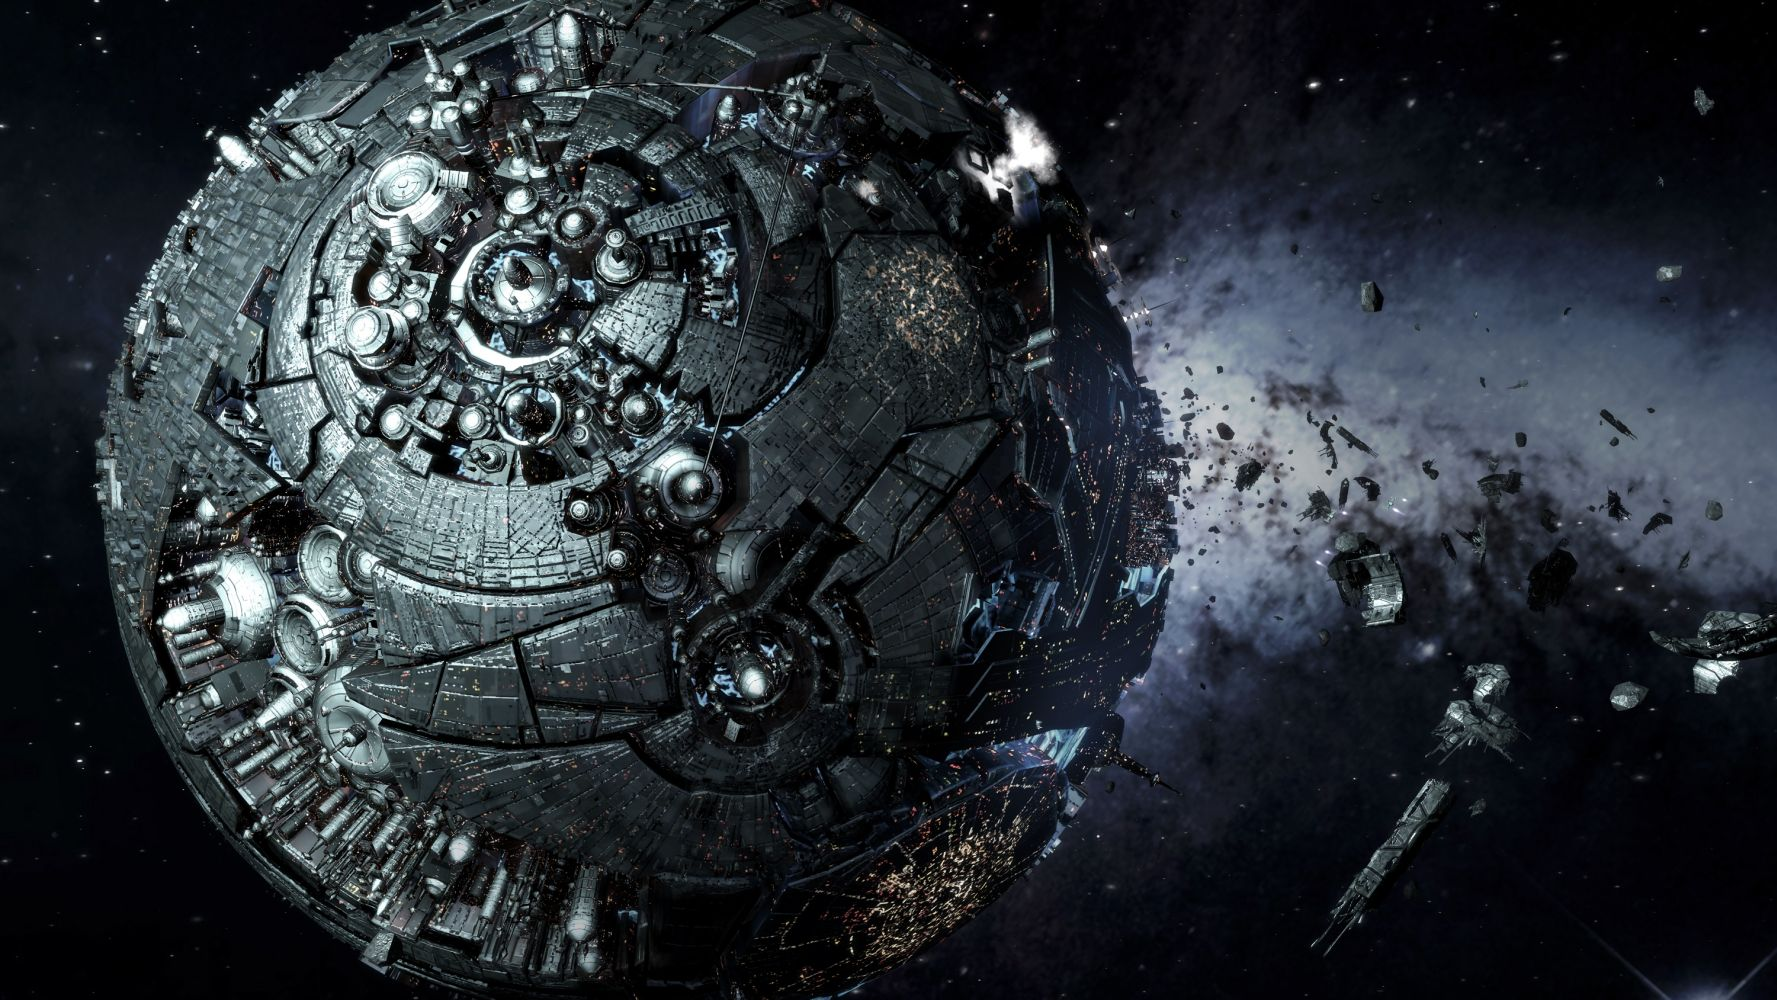 Transformers War For Cybertron Wallpaper Video Games Blogger